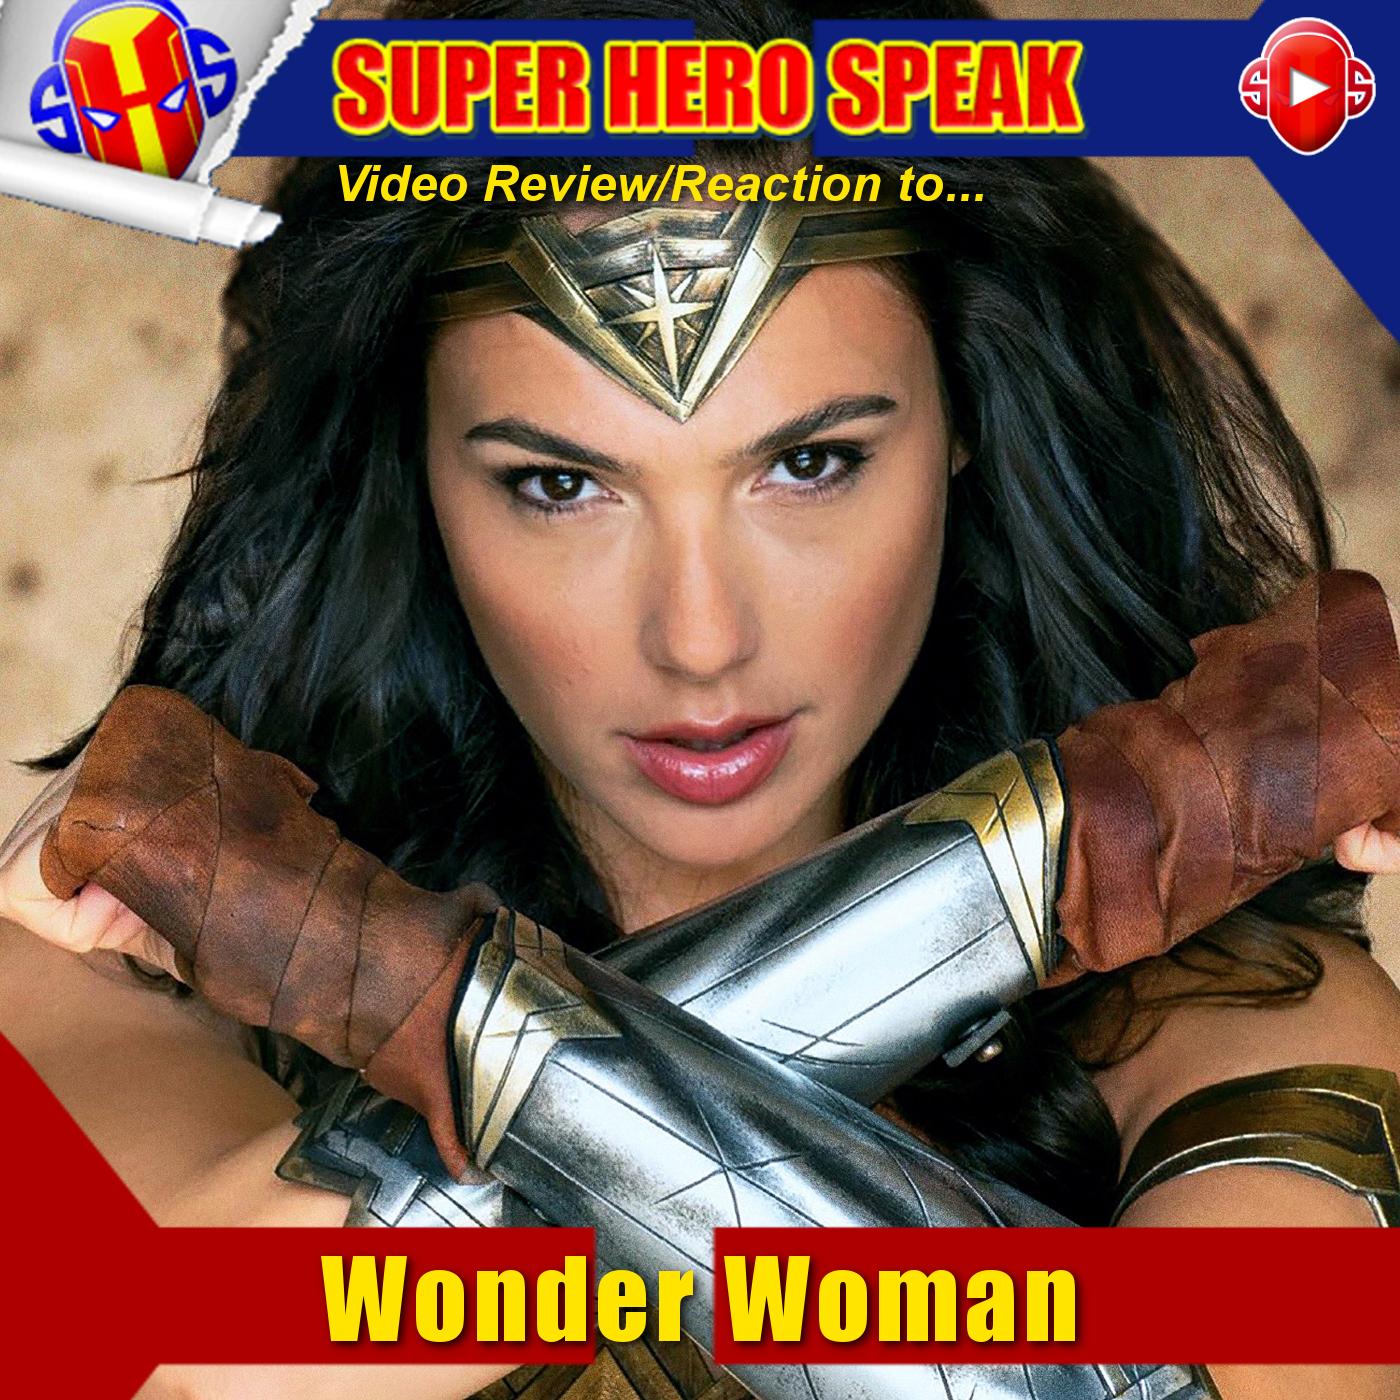 Wonder Woman Video Review (Spoiler Free)